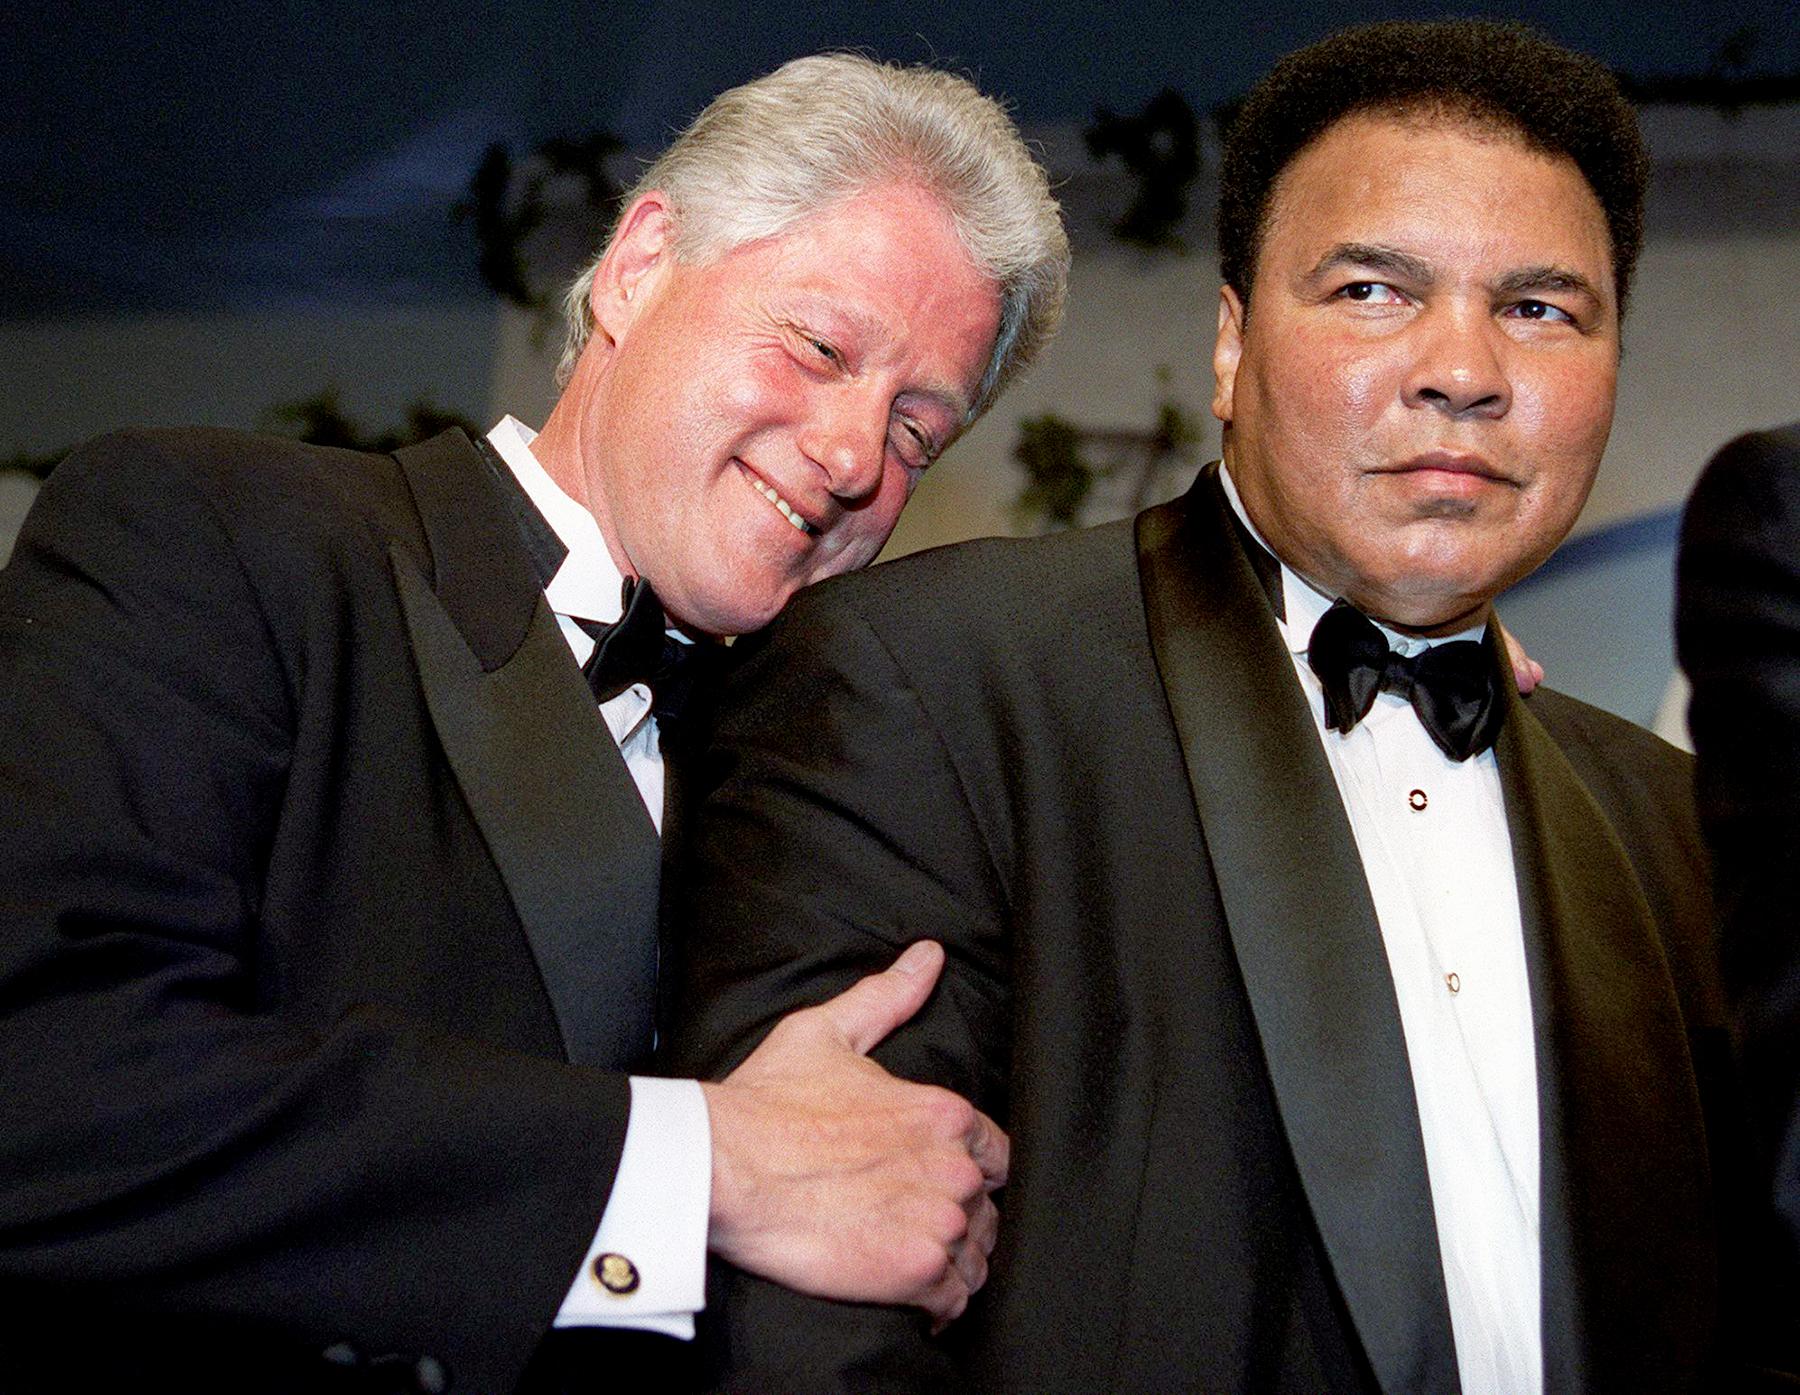 Bill Clinton leans on former world boxing heavyweight champion Muhammad Ali at the National Italian American Foundation 25th Anniversary Awards Gala Dinner at a Washington, D.C. hotel, Oct. 28, 2000.